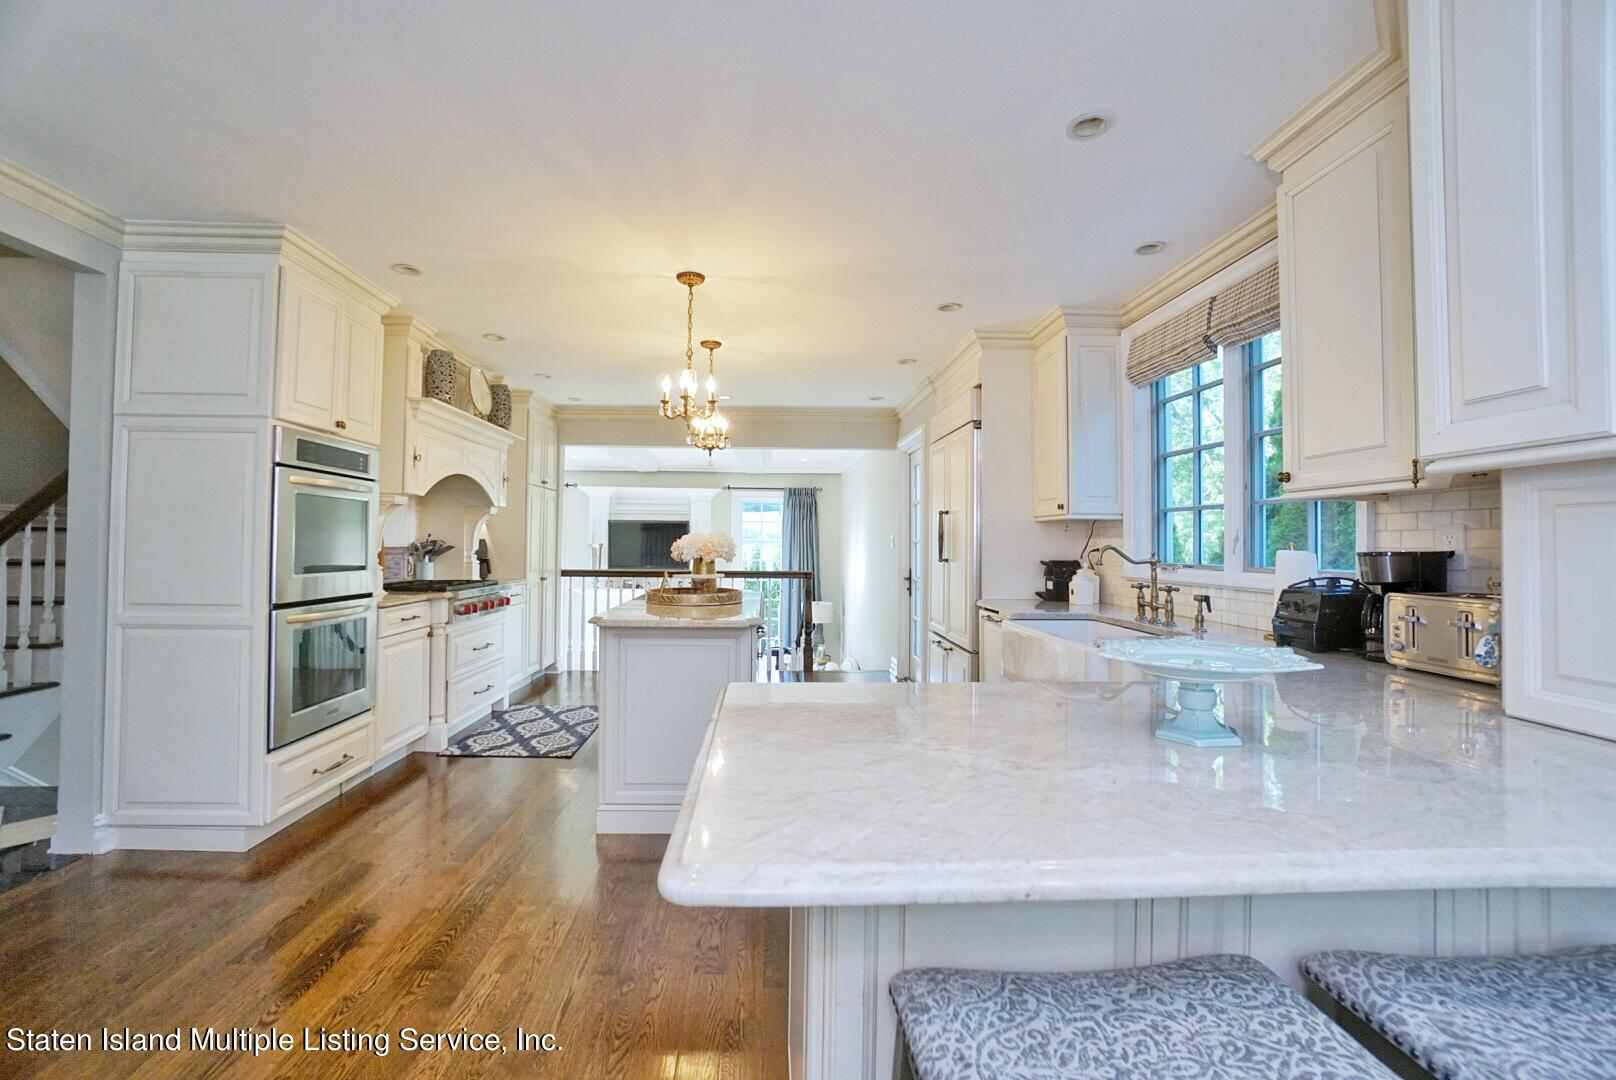 Single Family - Detached 116 Fine Blvd   Staten Island, NY 10314, MLS-1148291-20